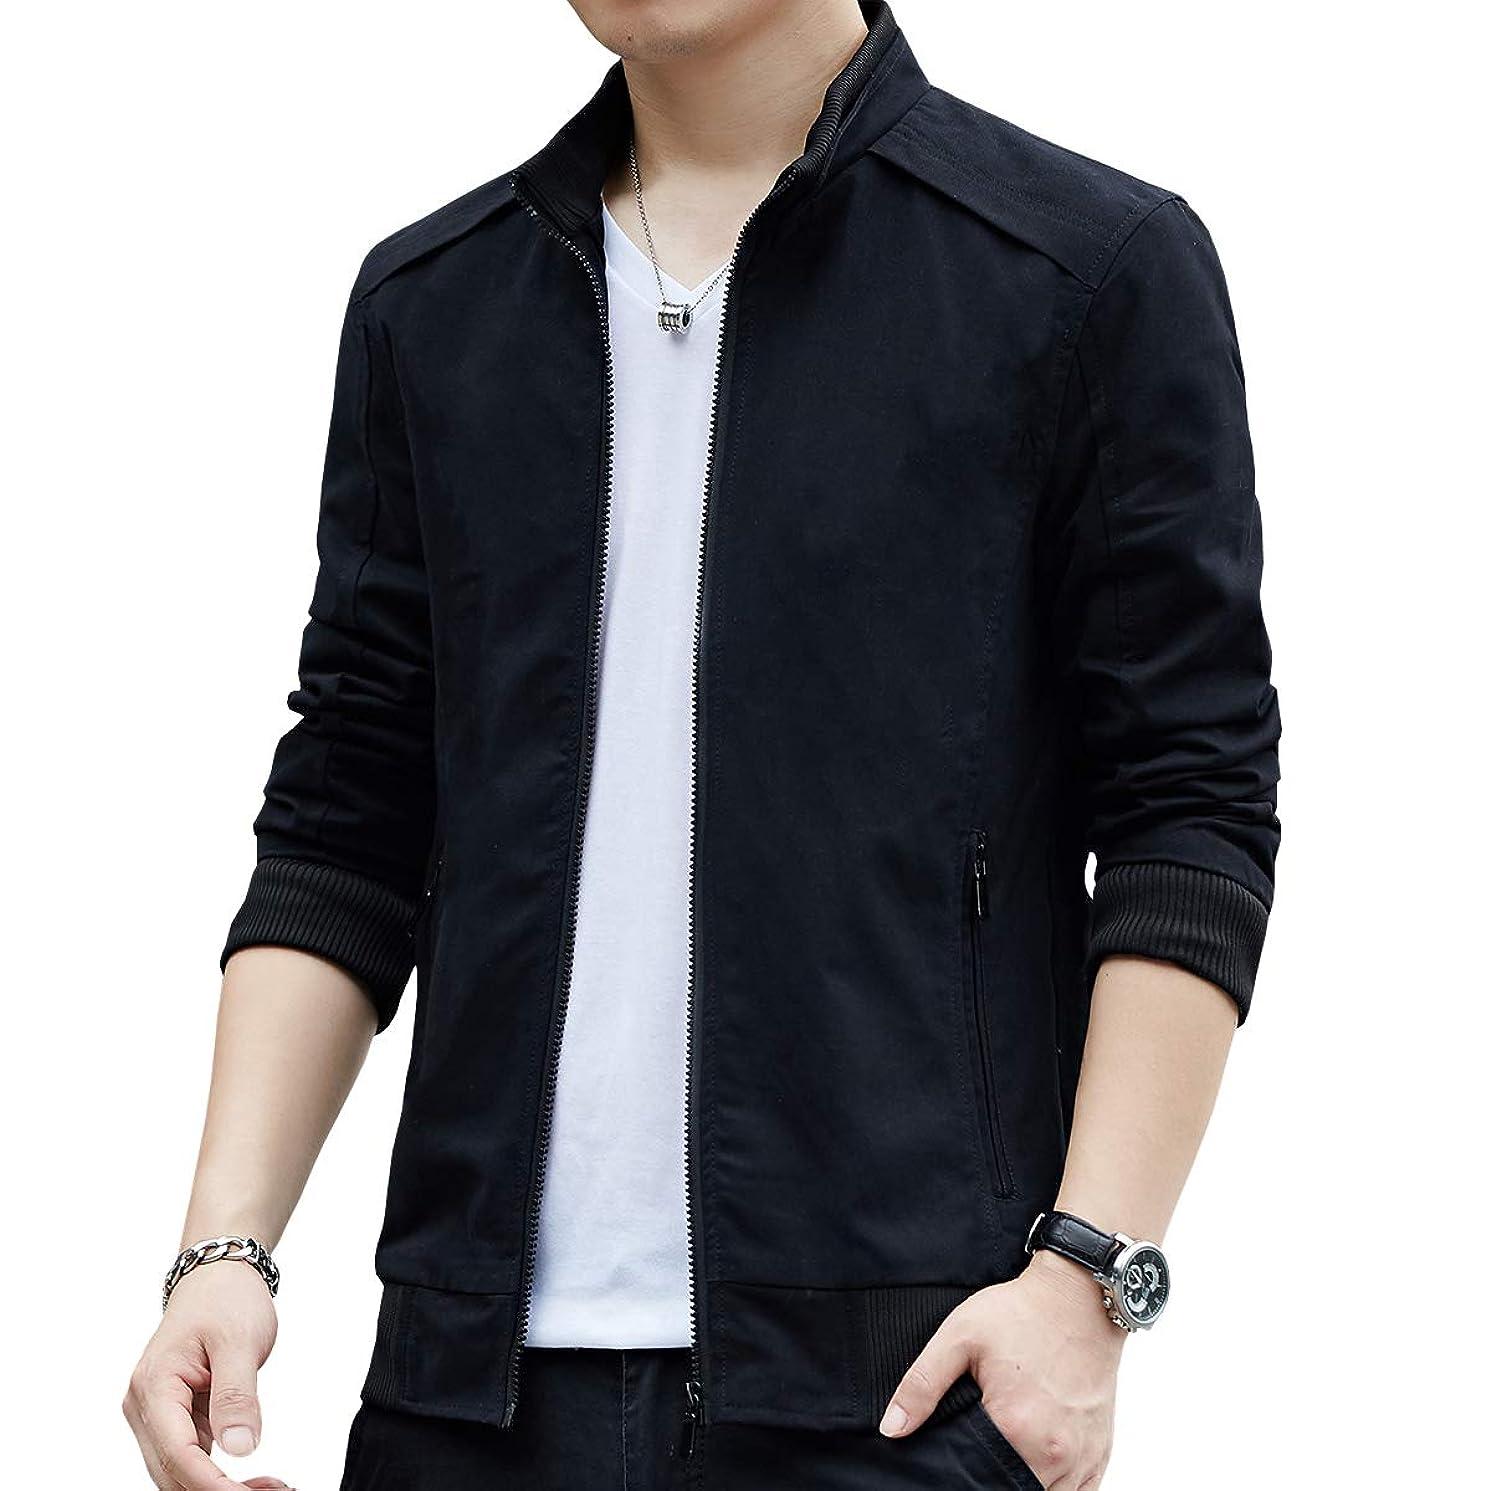 Womleys Mens Casual Windbreaker Outerwear Slim Fit Cotton Lightweight Jackets